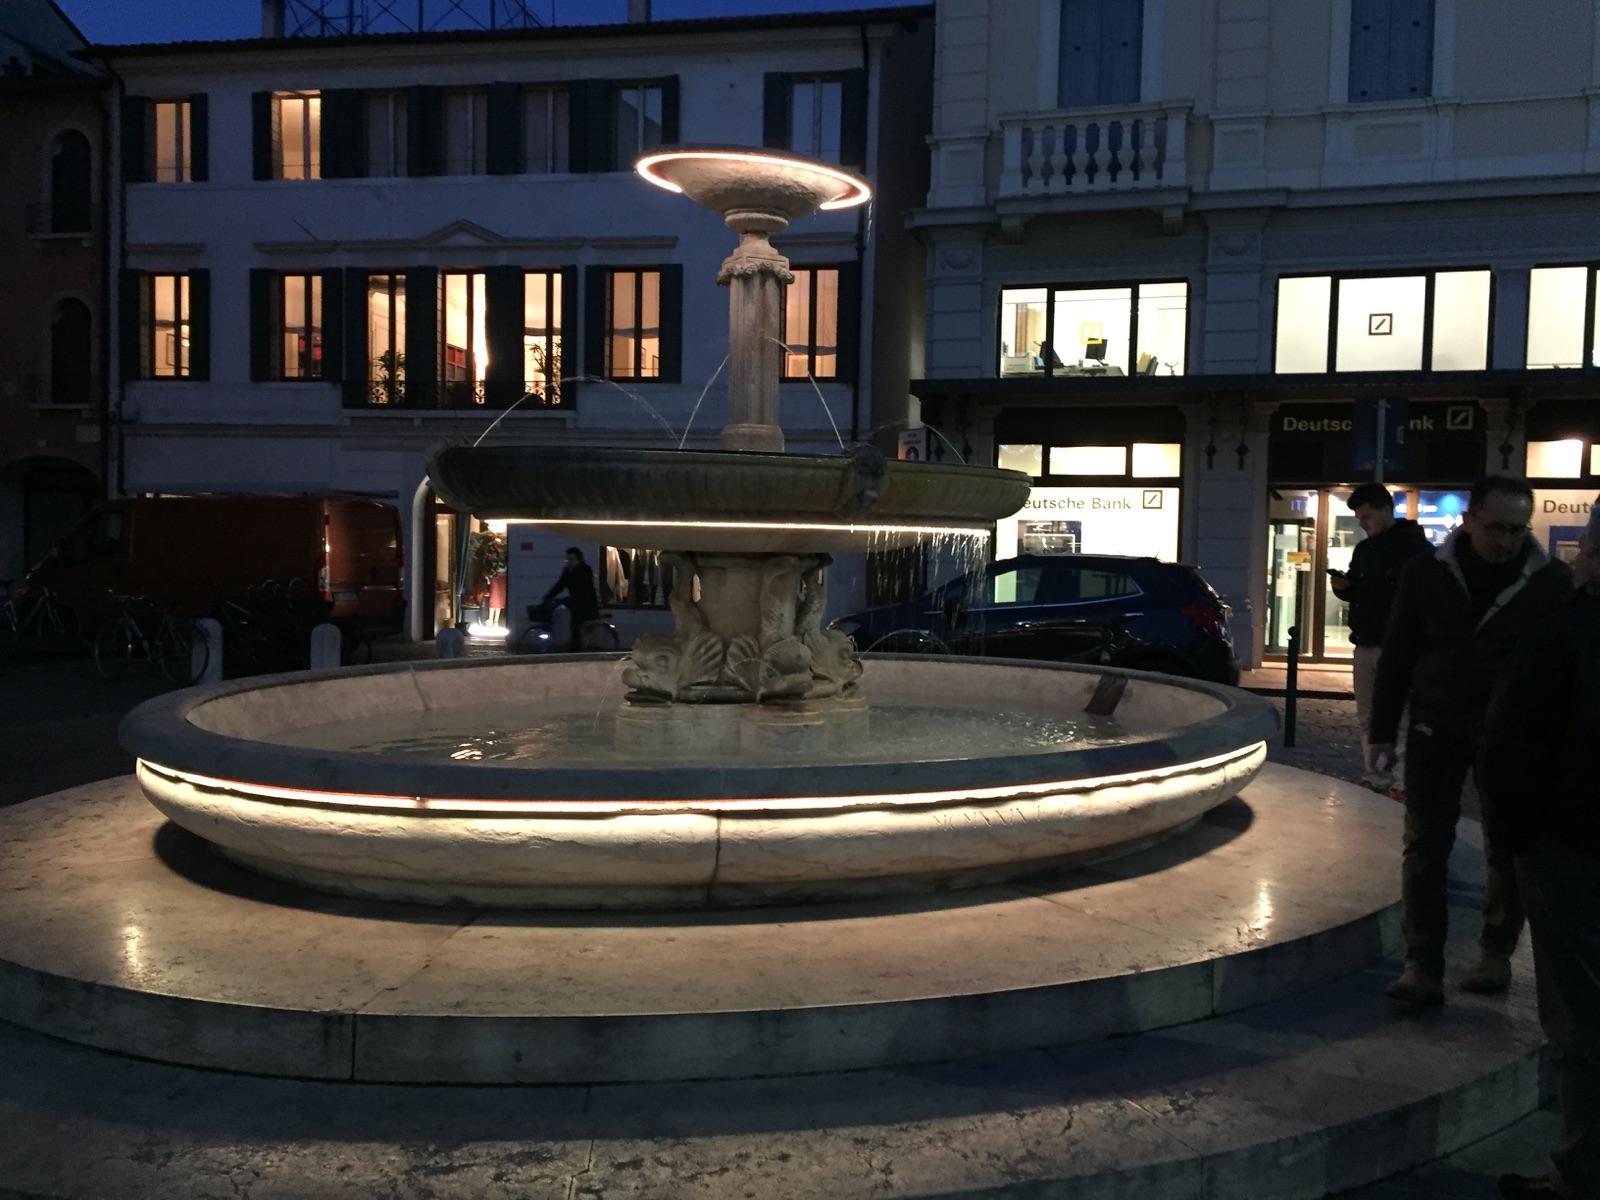 La fontana illuminata di bianco caldo